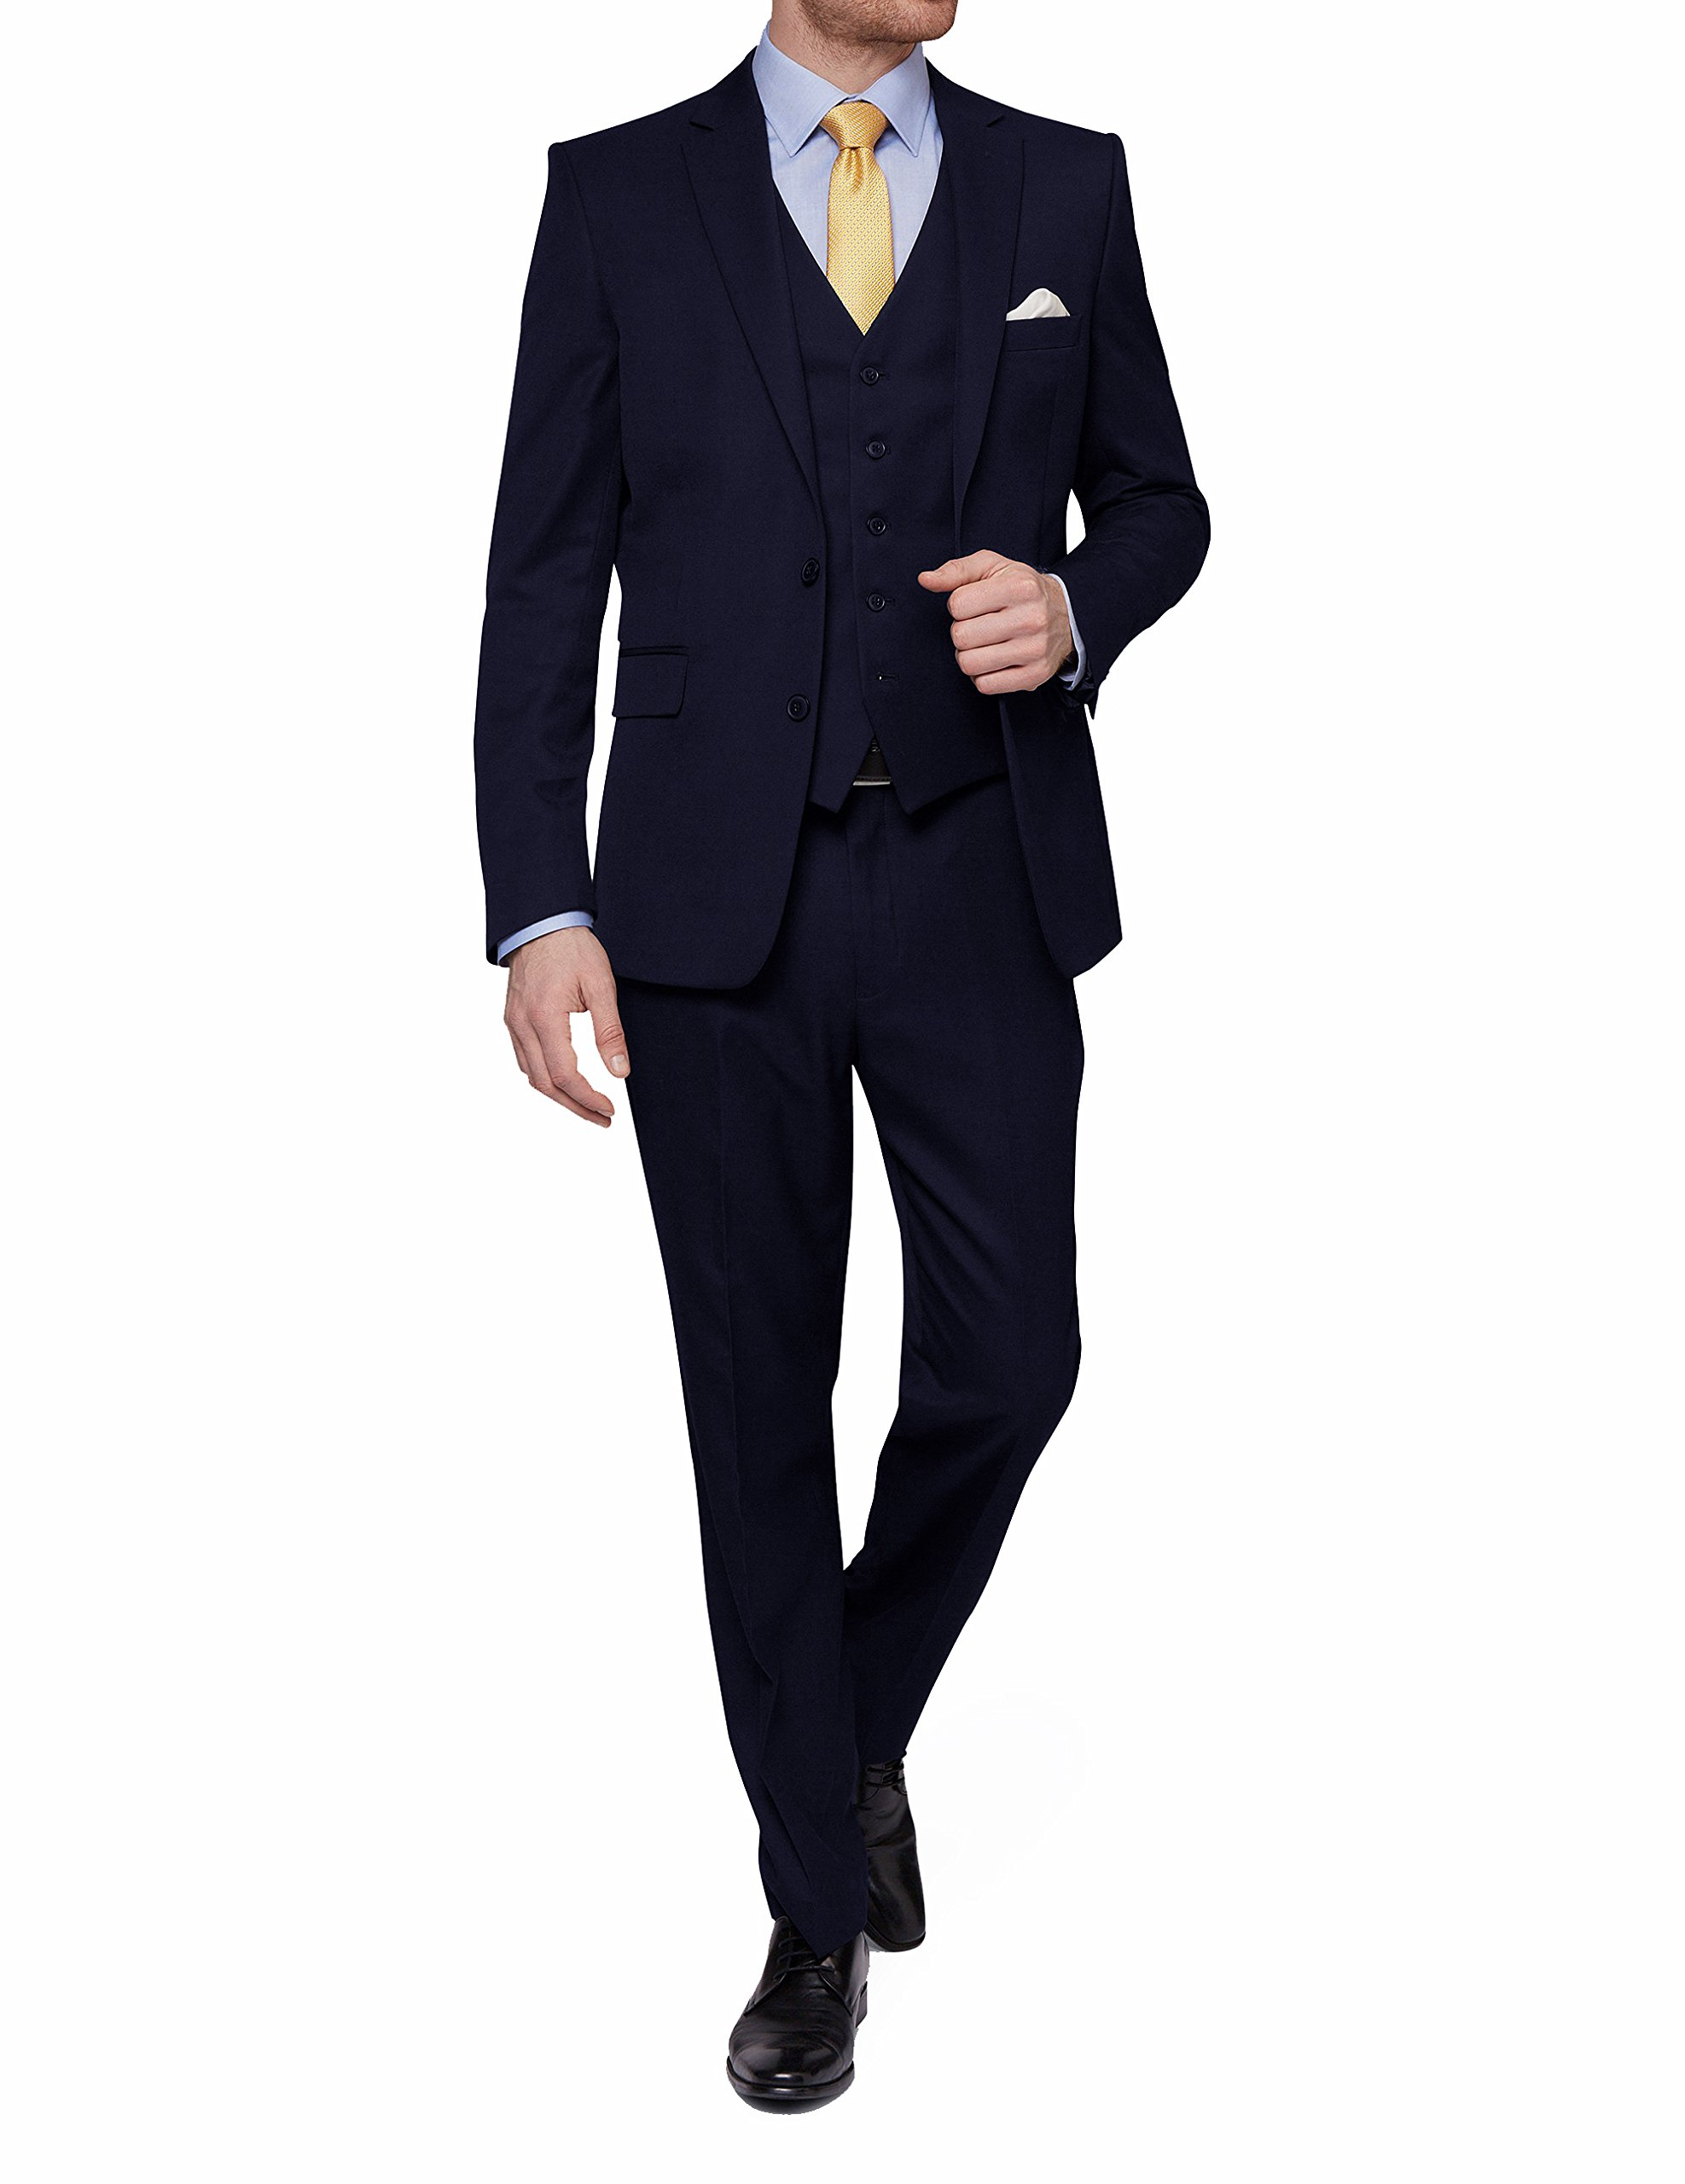 MDRN Uomo Mens Slim Fit 3 Piece Suit, Navy, Size 44Sx38W